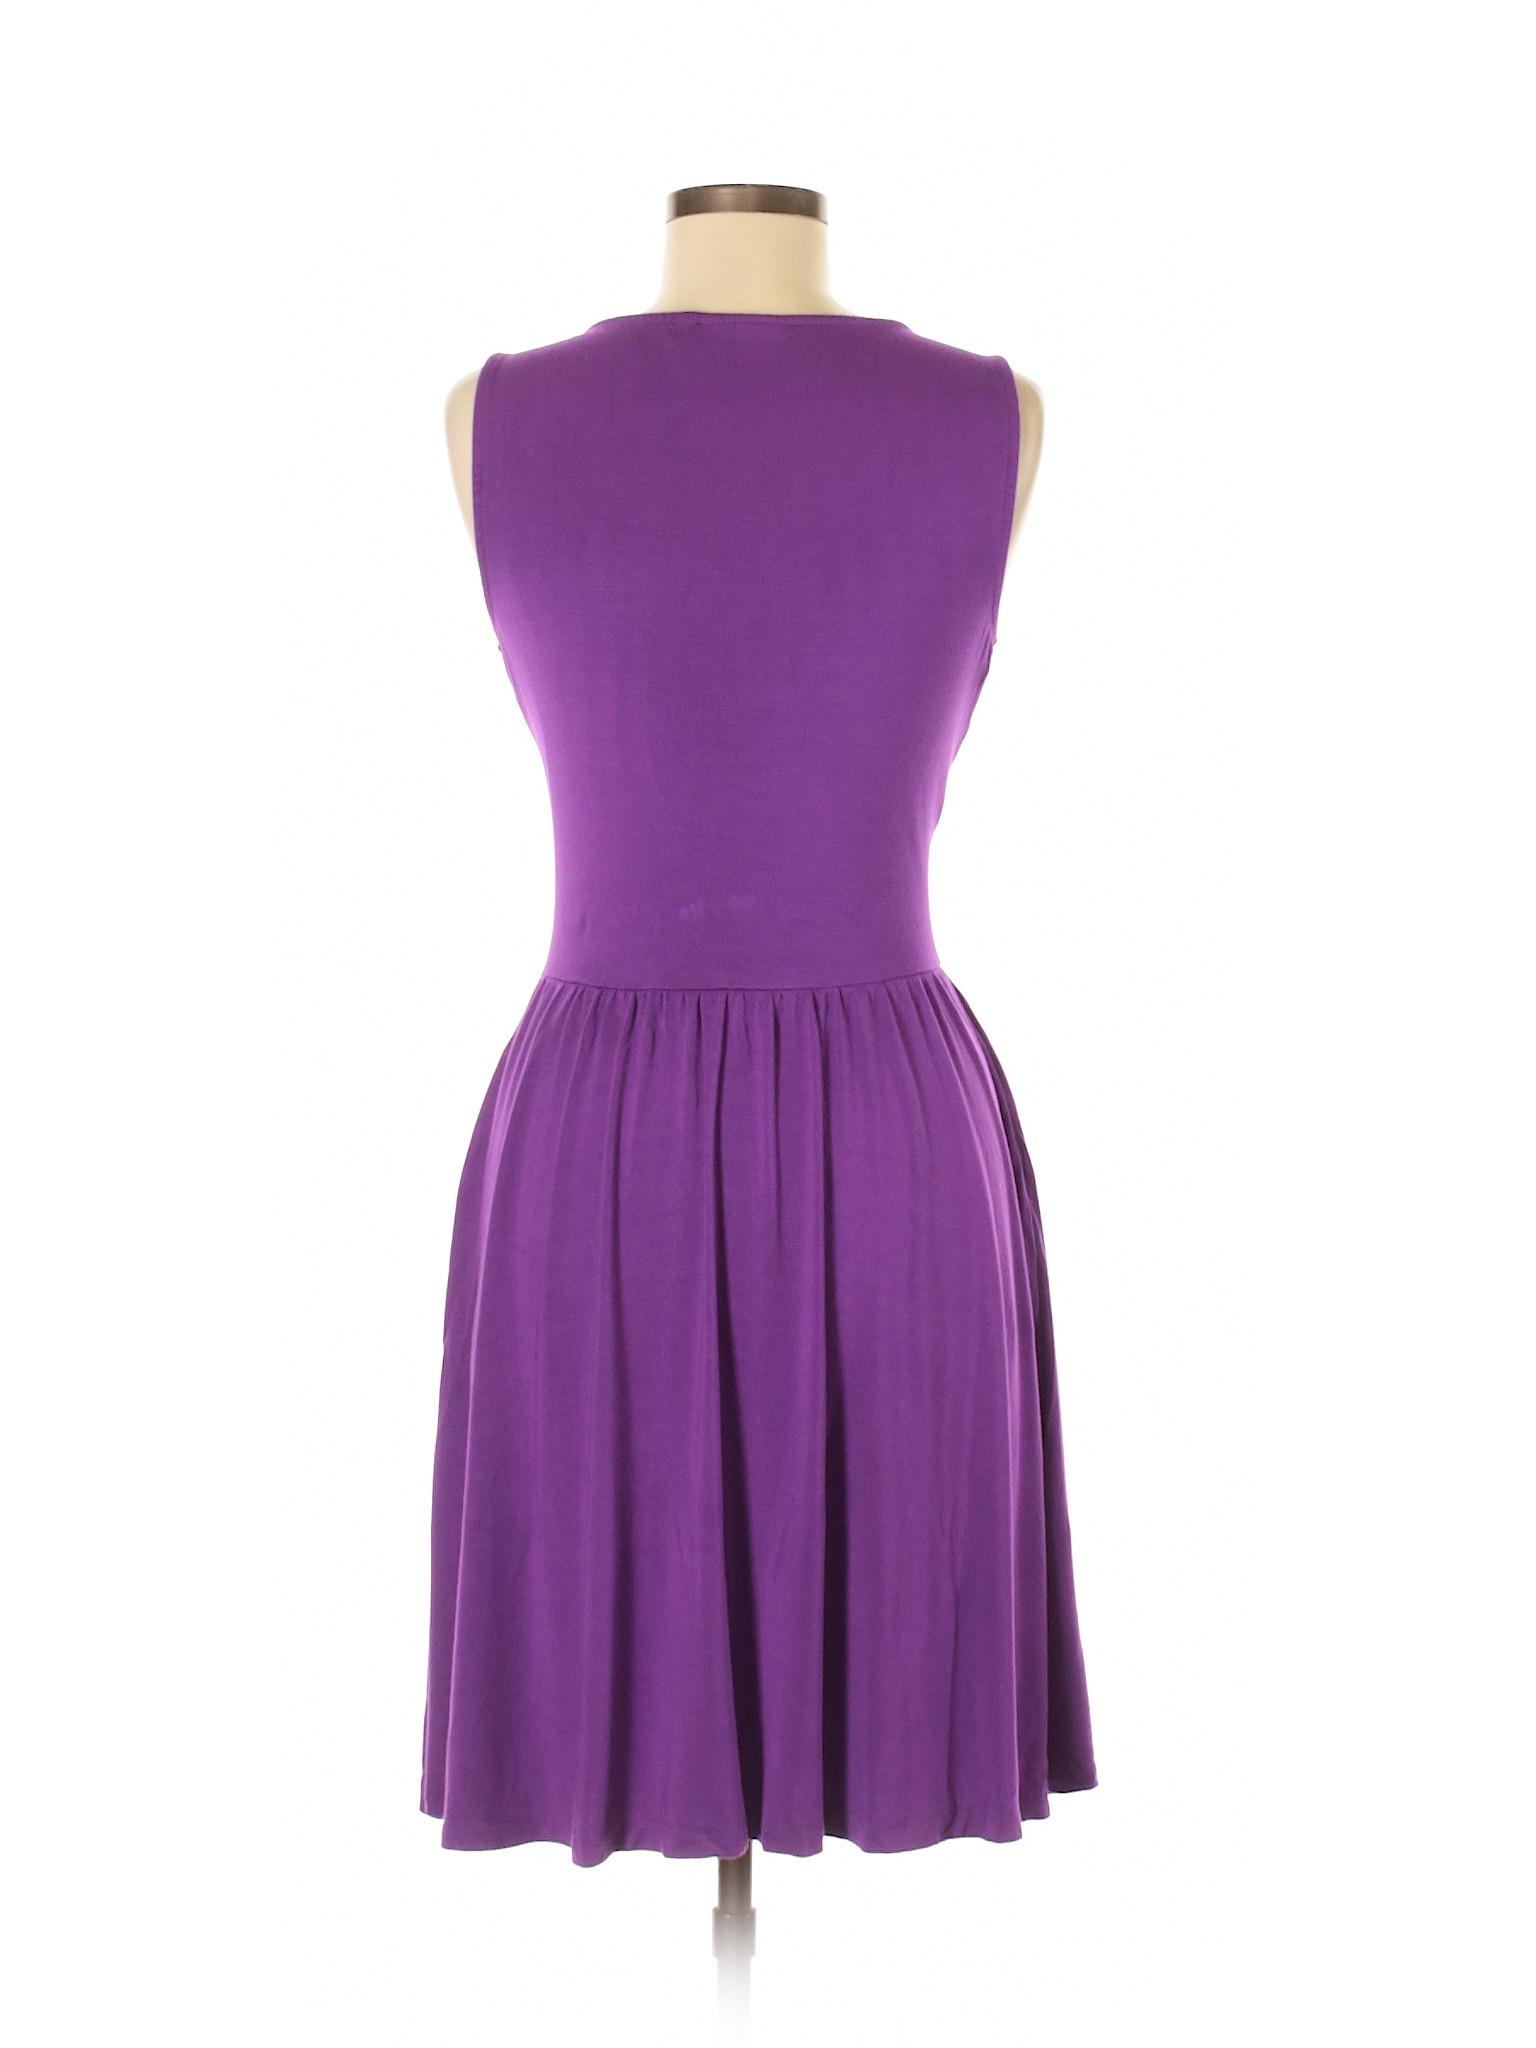 Casual Casual Dress Selling 9 9 Apt Dress Selling Apt xr4FSw0nr